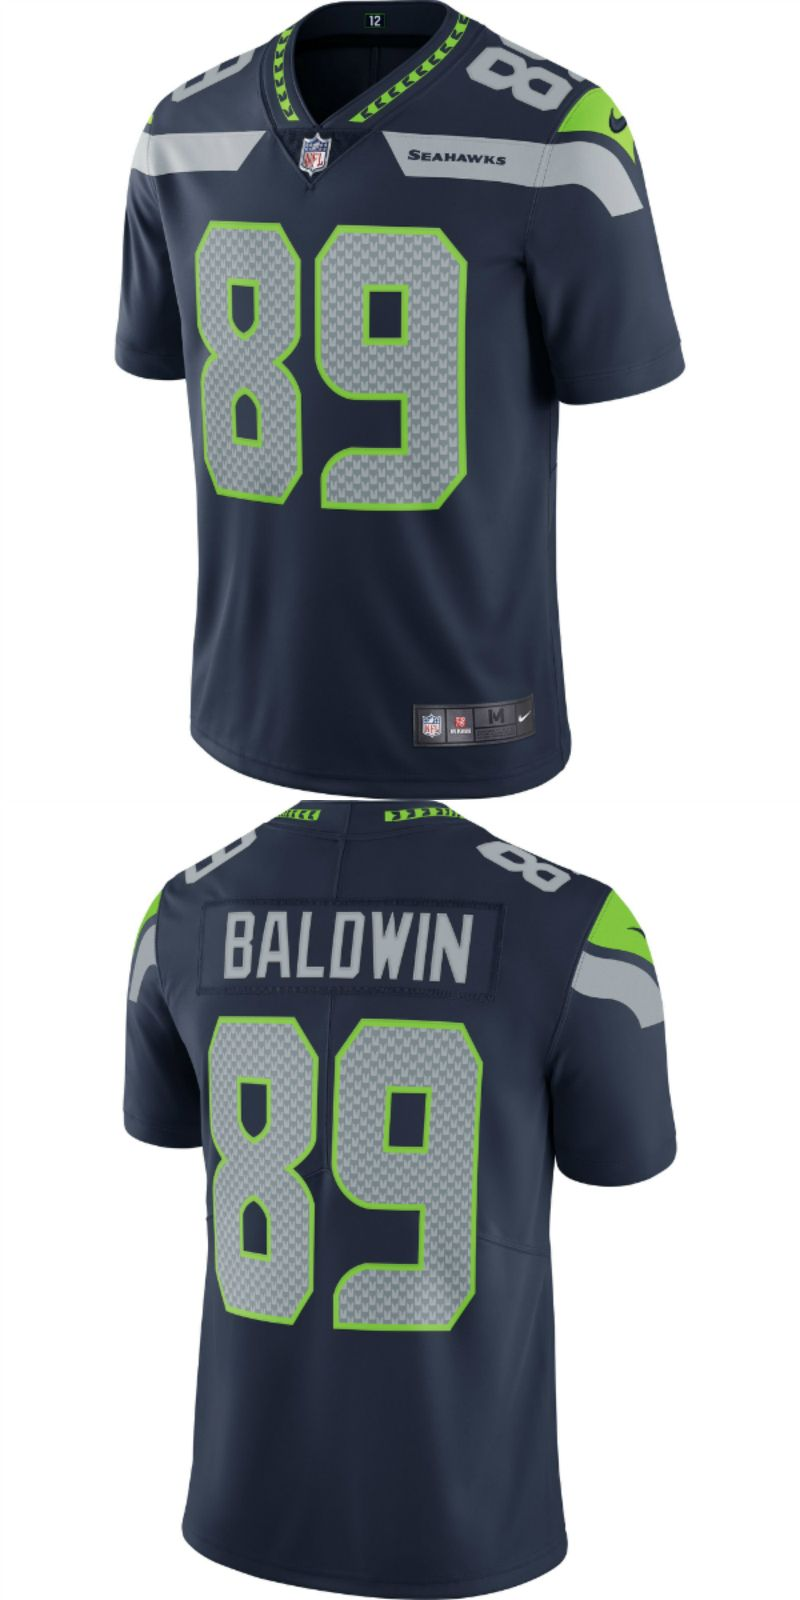 huge discount e7517 1d53c UP TO 70% OFF. Doug Baldwin Seattle Seahawks Nike Vapor ...